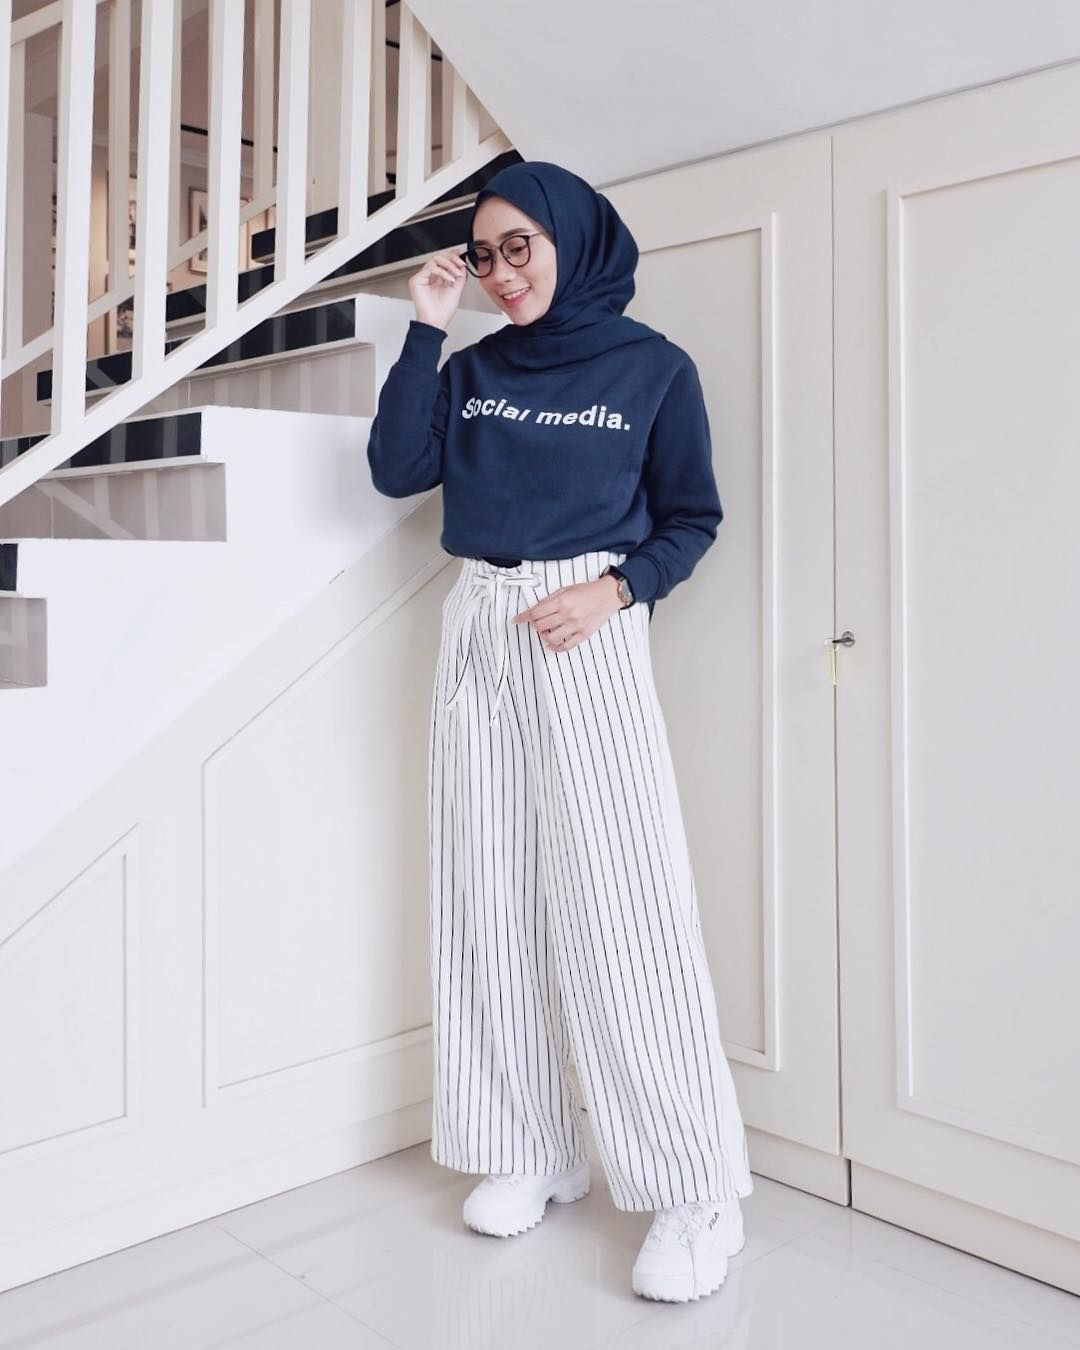 Hijab Fashion Hijabfashioninspiration Hijab Fashion Fashion Outfits Hijab Hijab Fashionista